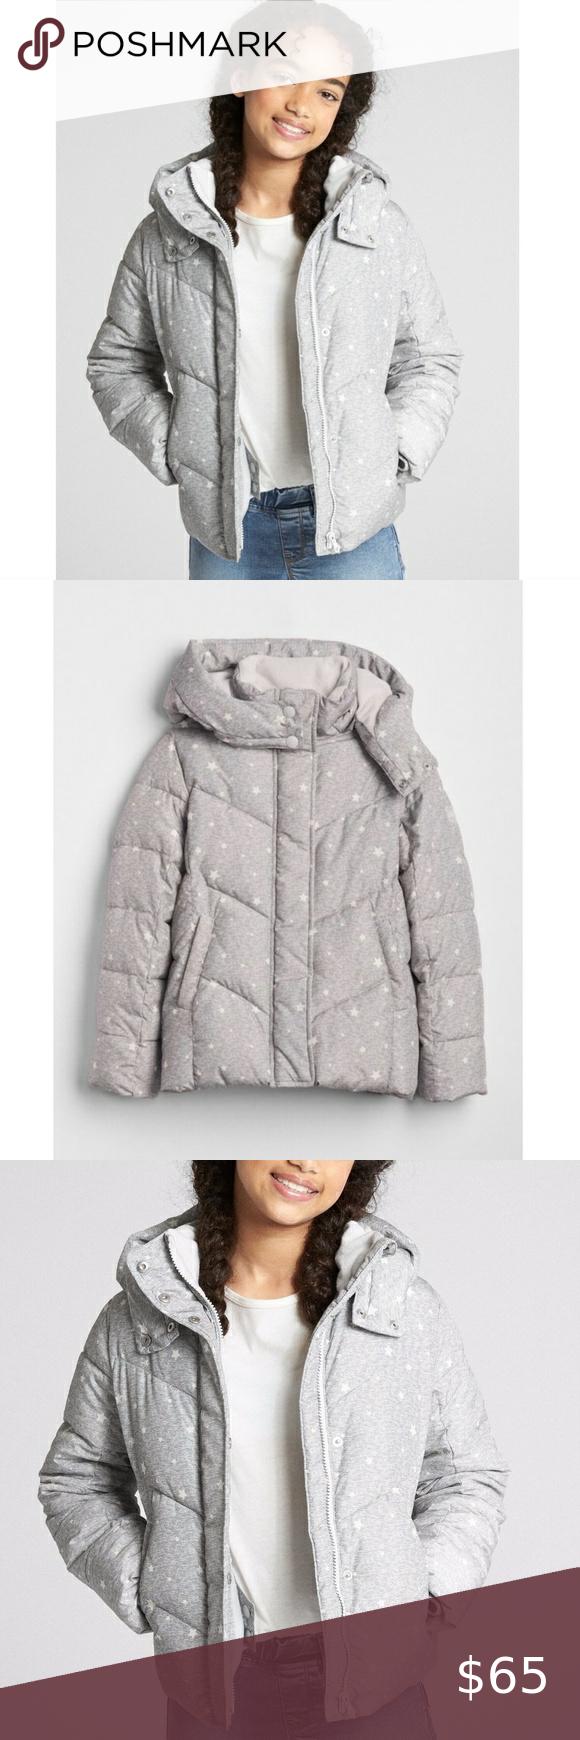 Gap Kids Cold Control Max Puffer Jacket Jackets Puffer Jackets Clothes Design [ 1740 x 580 Pixel ]